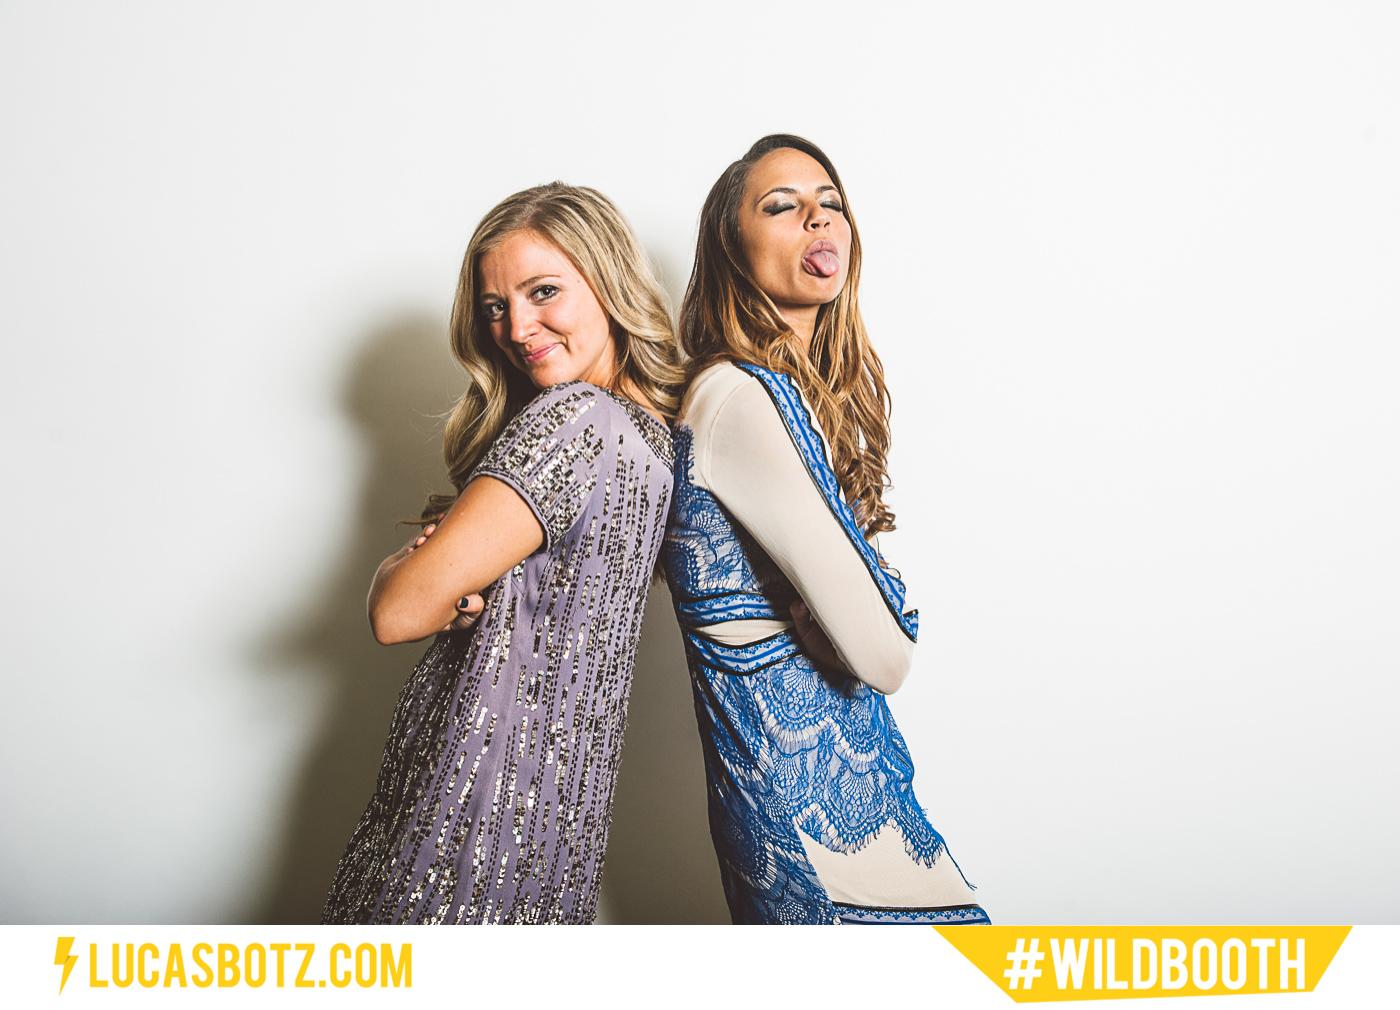 Michelle and Jennifer Wildbooth_02.jpg